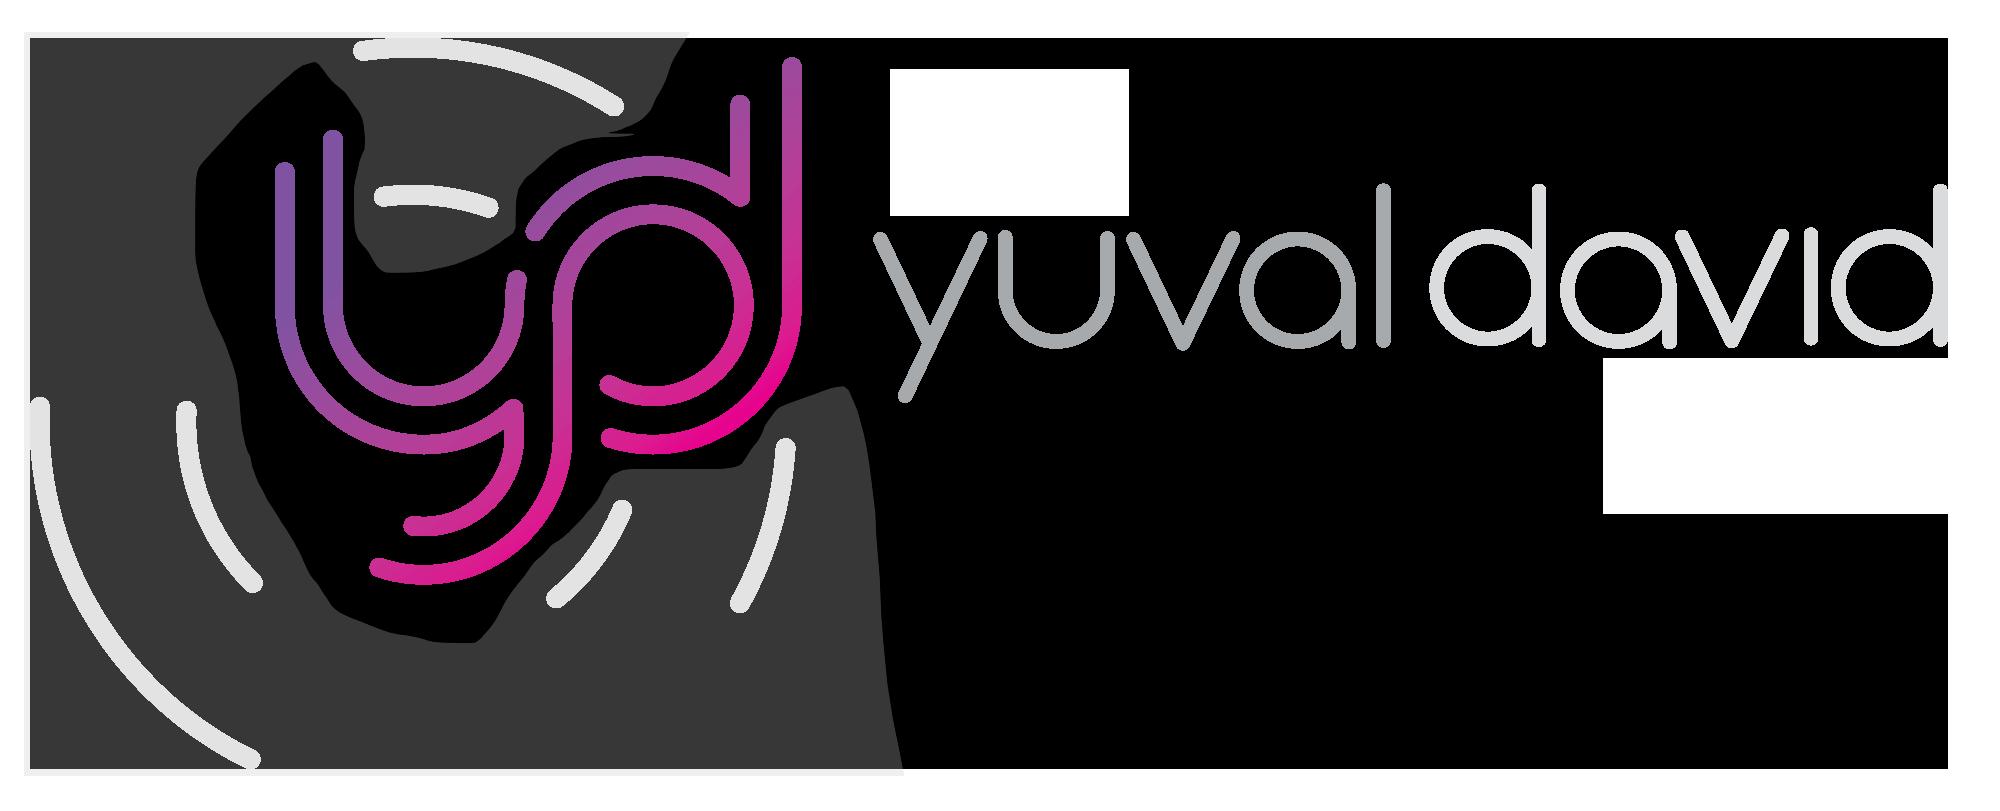 YUVAL_PLUM_H_LRG_onwhite